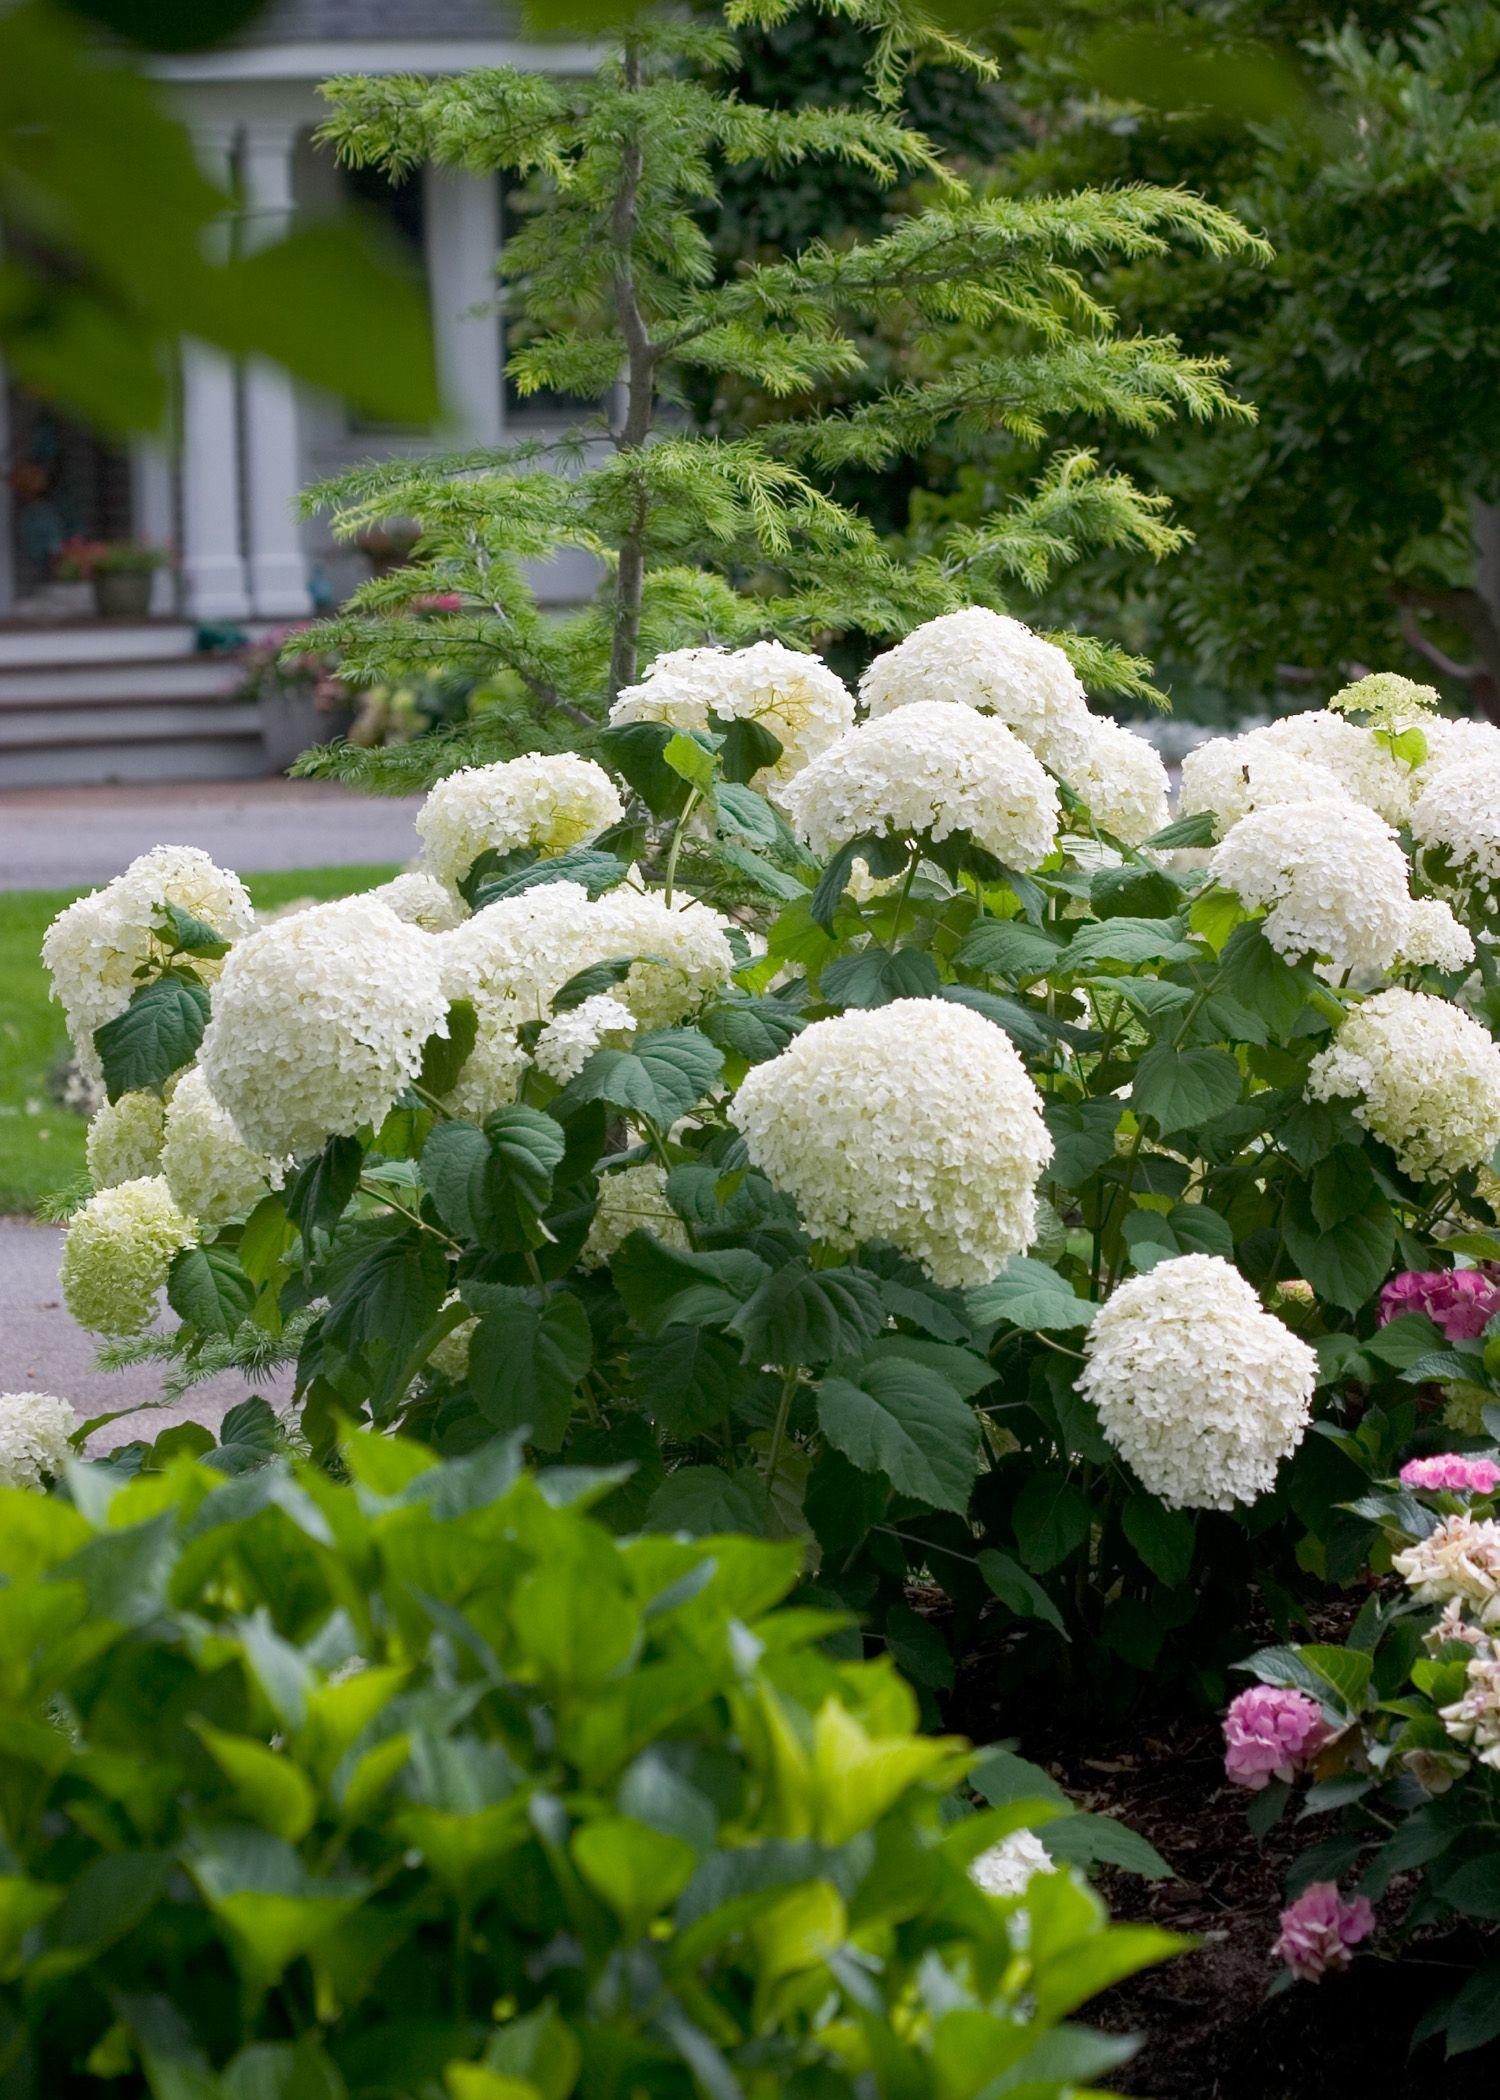 Pin By Revival Market On Wv Garden Smooth Hydrangea Incrediball Hydrangea Hydrangea Arborescens